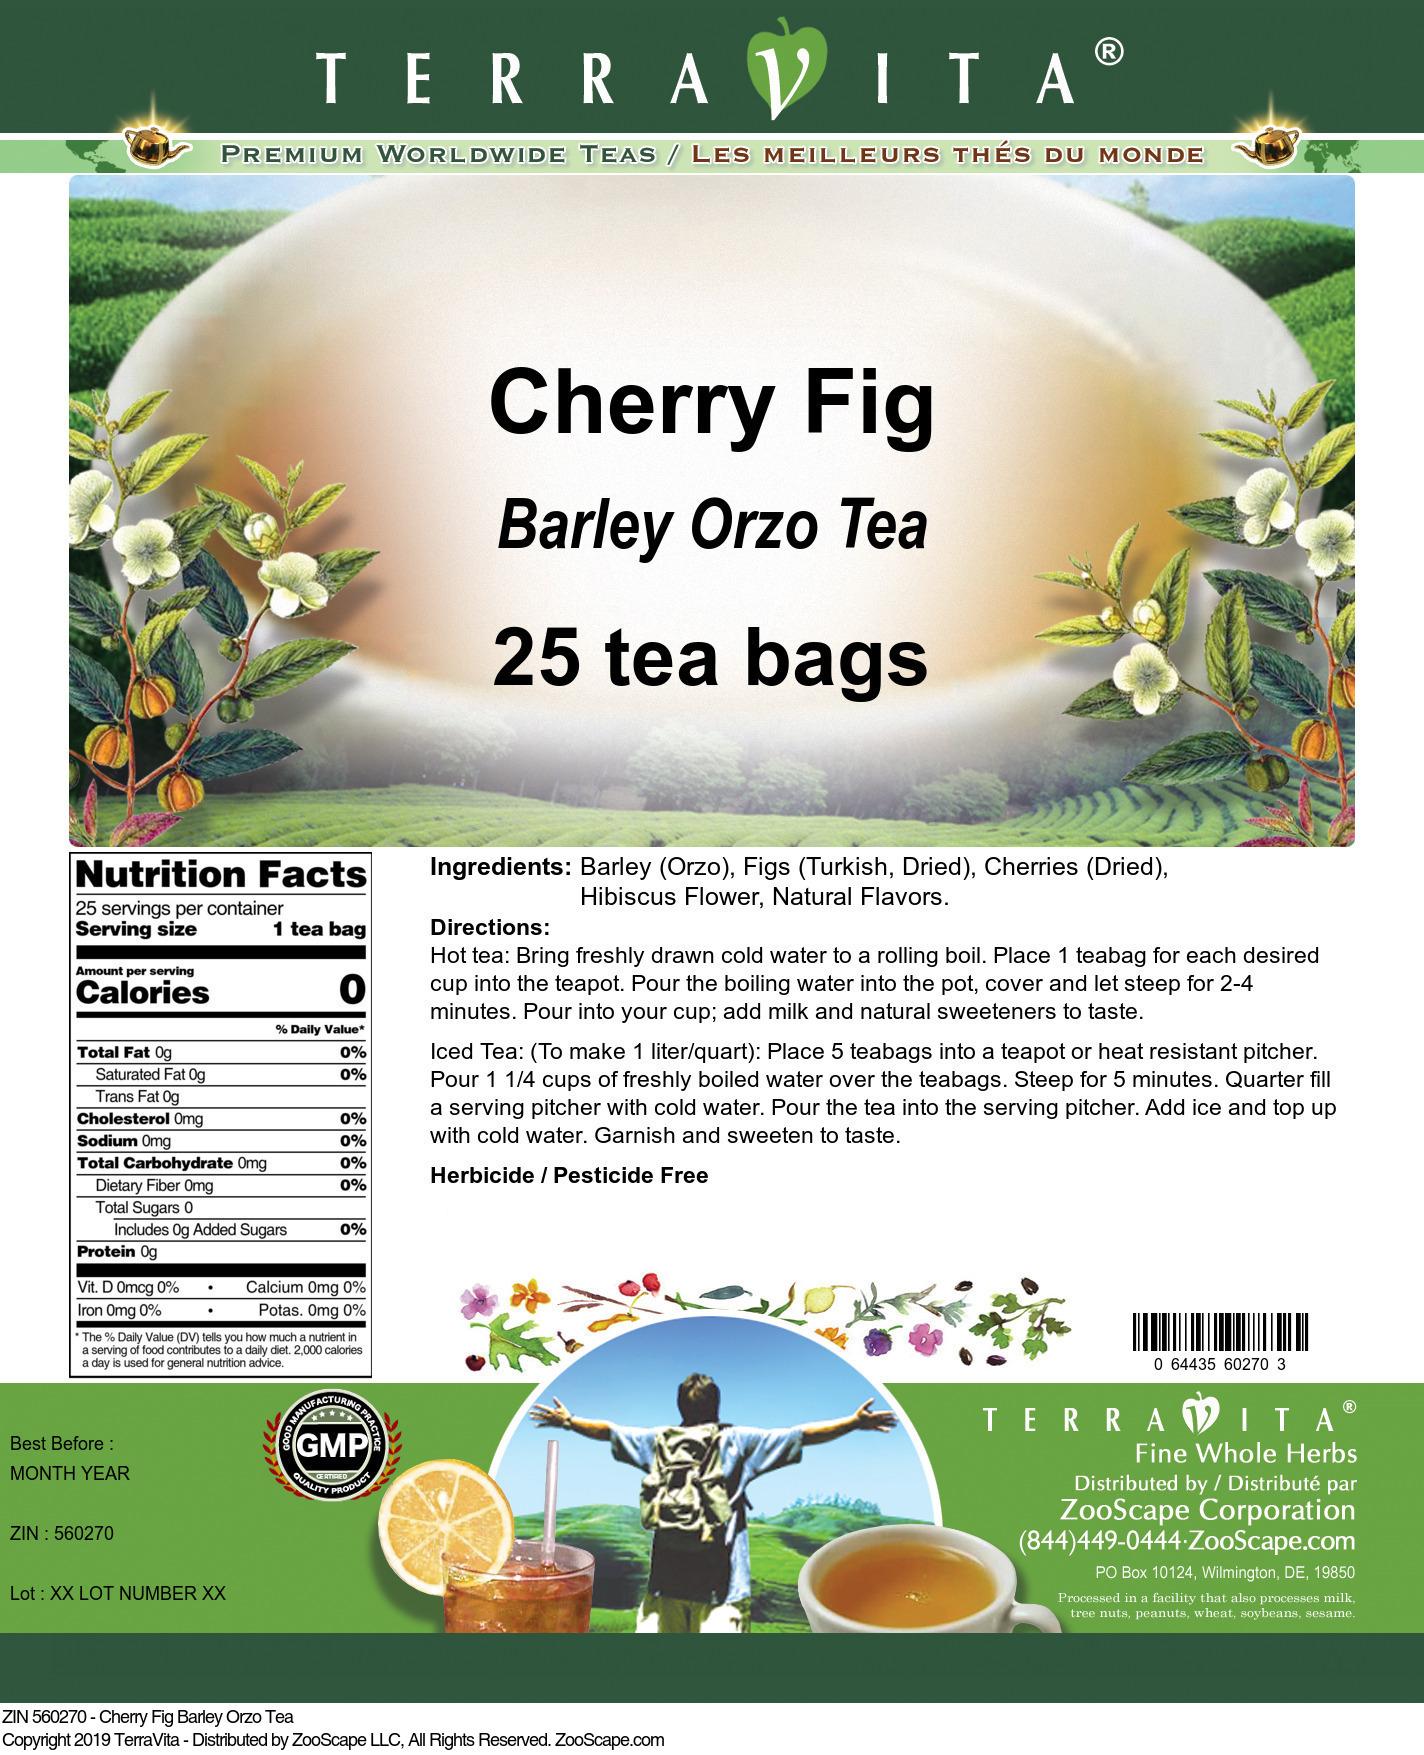 Cherry Fig Barley Orzo Tea